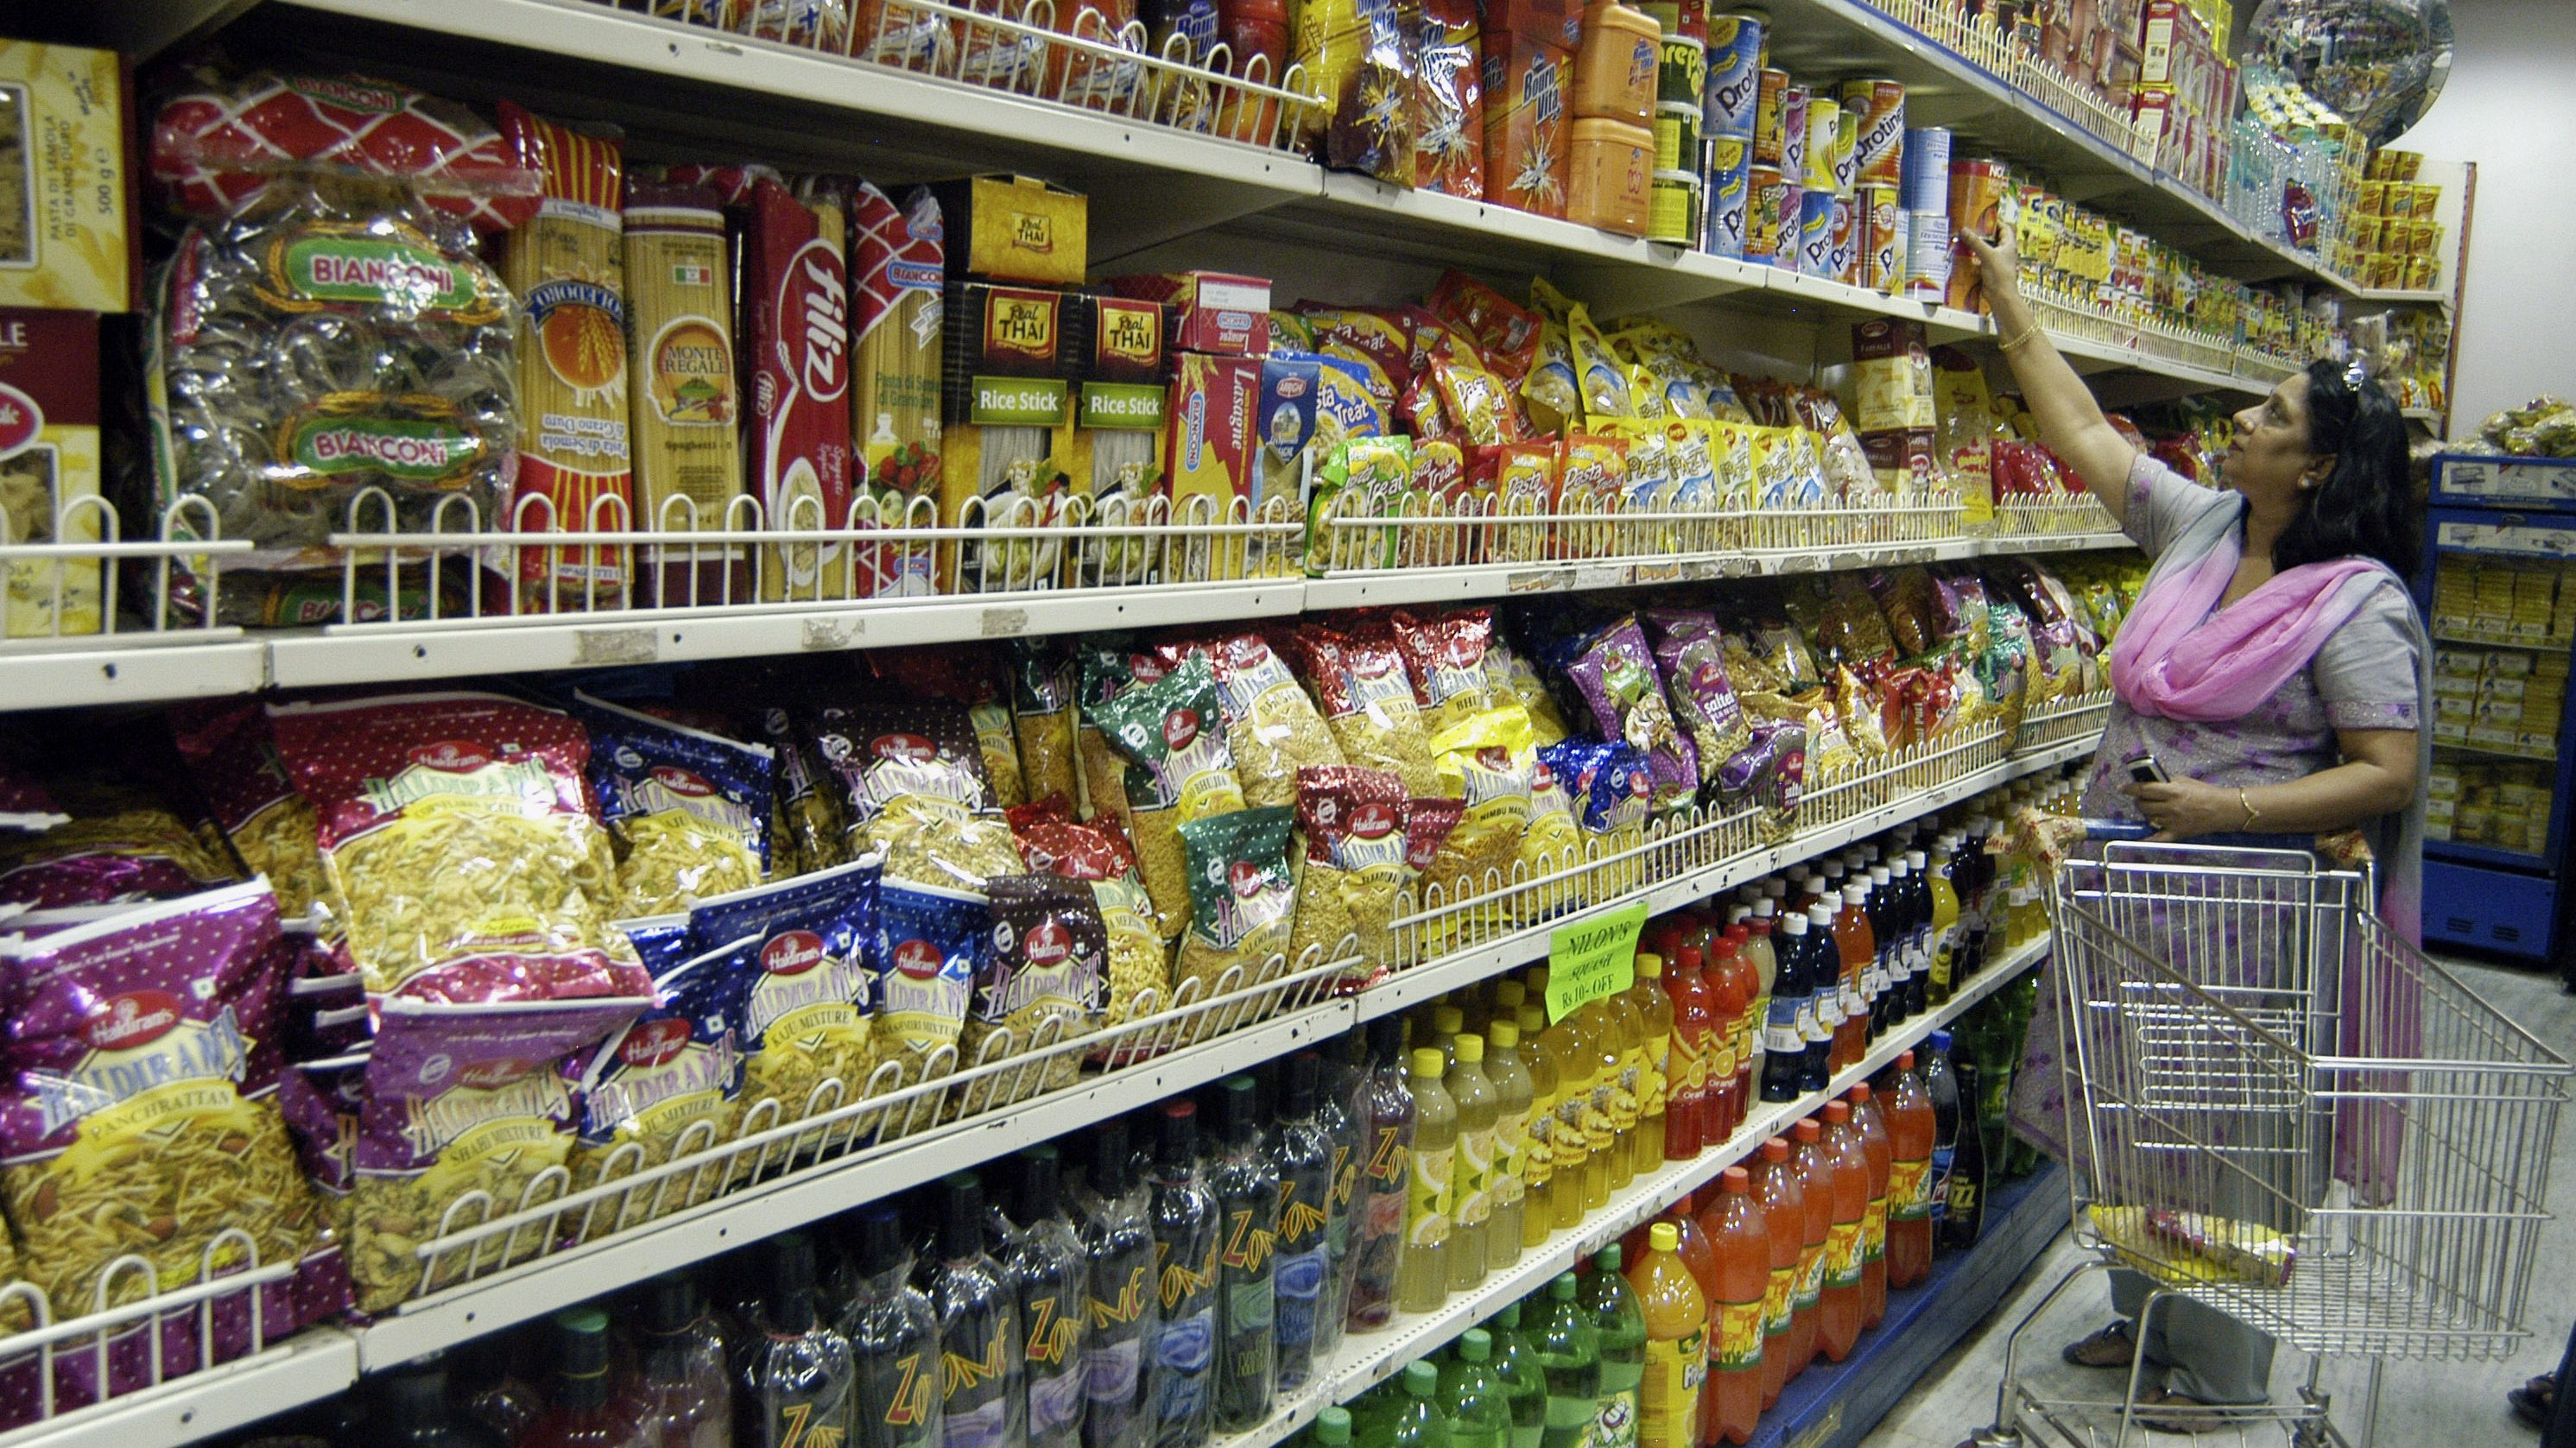 Flipkart is splurging Walmart's dollars to go where Amazon is